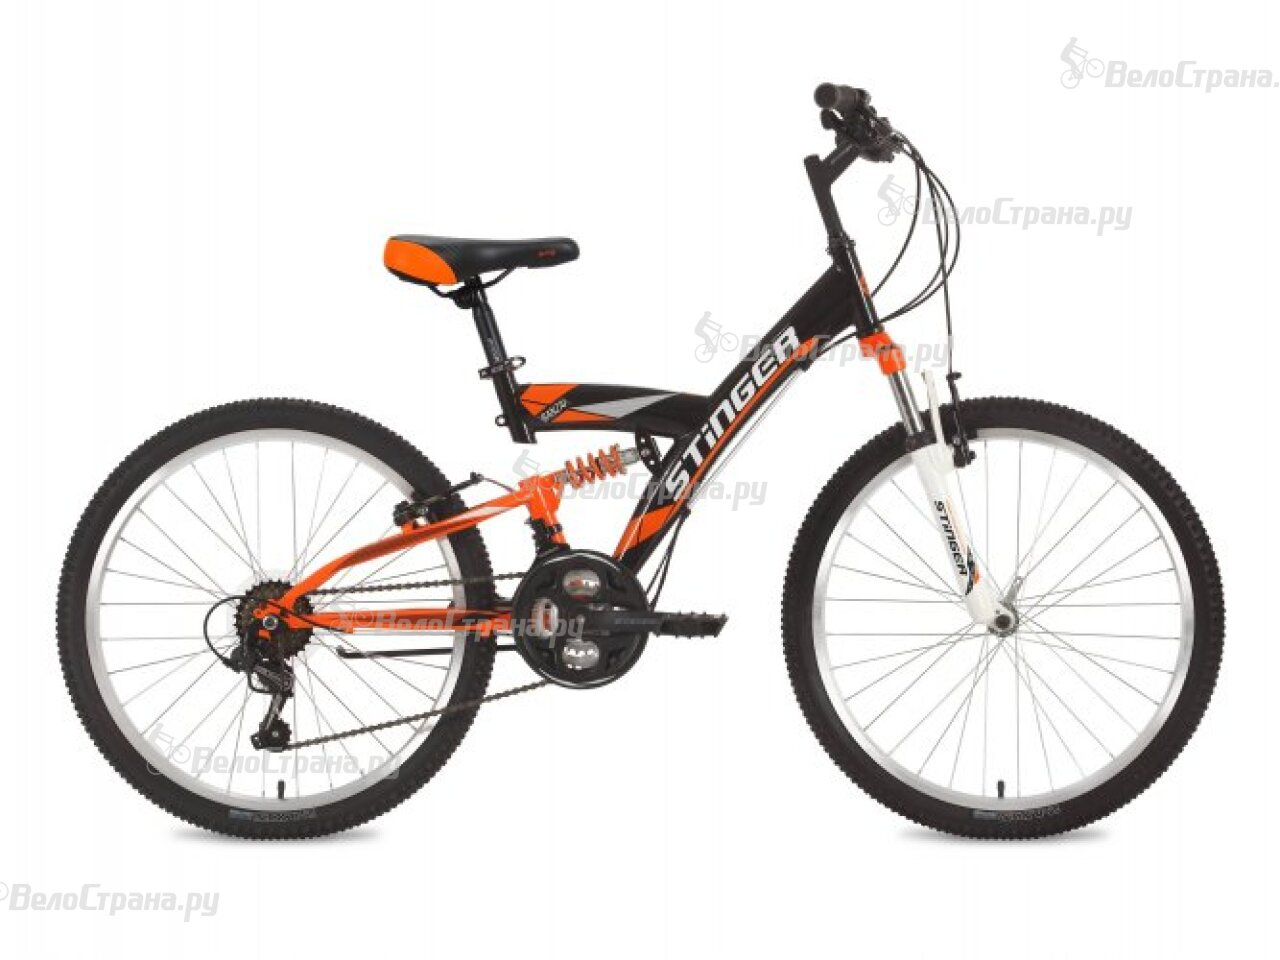 Велосипед Stinger Banzai 24 (2018) stinger banzai 18 2016 х72830 к blue red